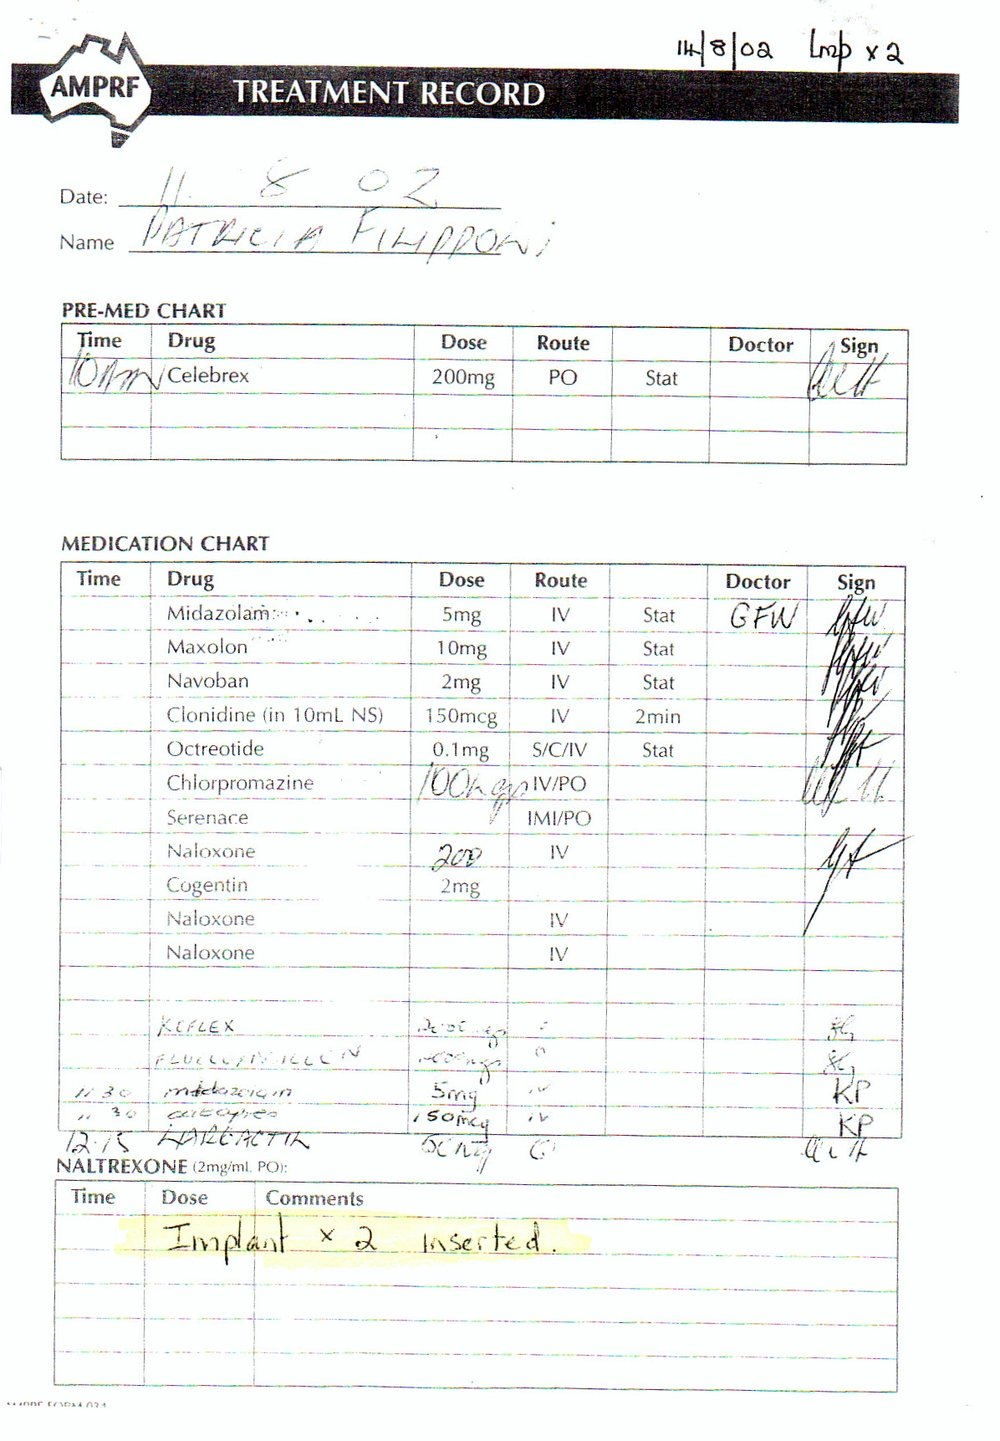 Naltrexone implant record.JPG